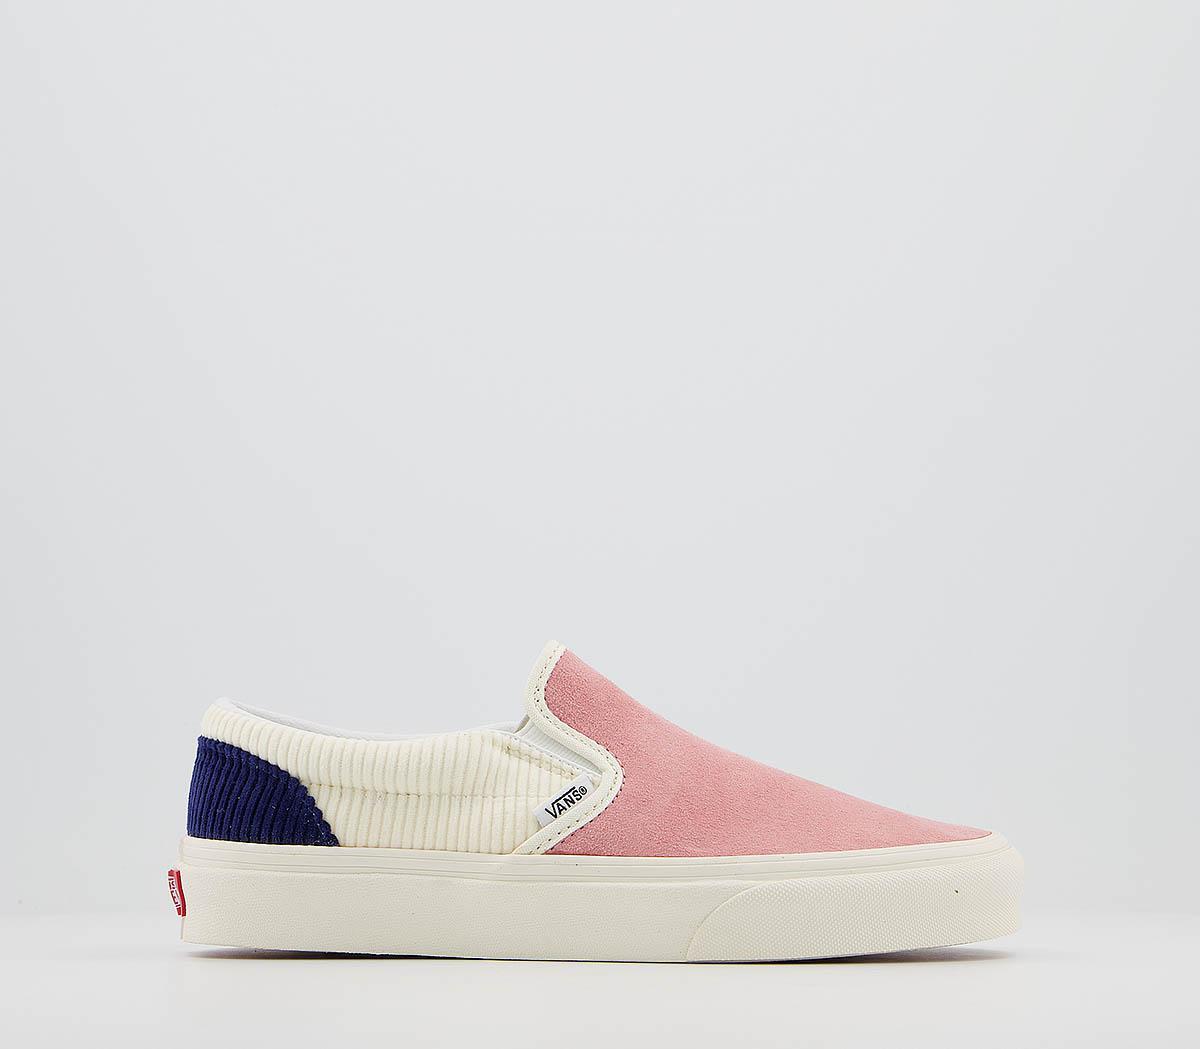 Vans Vans Classic Slip Ons Pink Icing